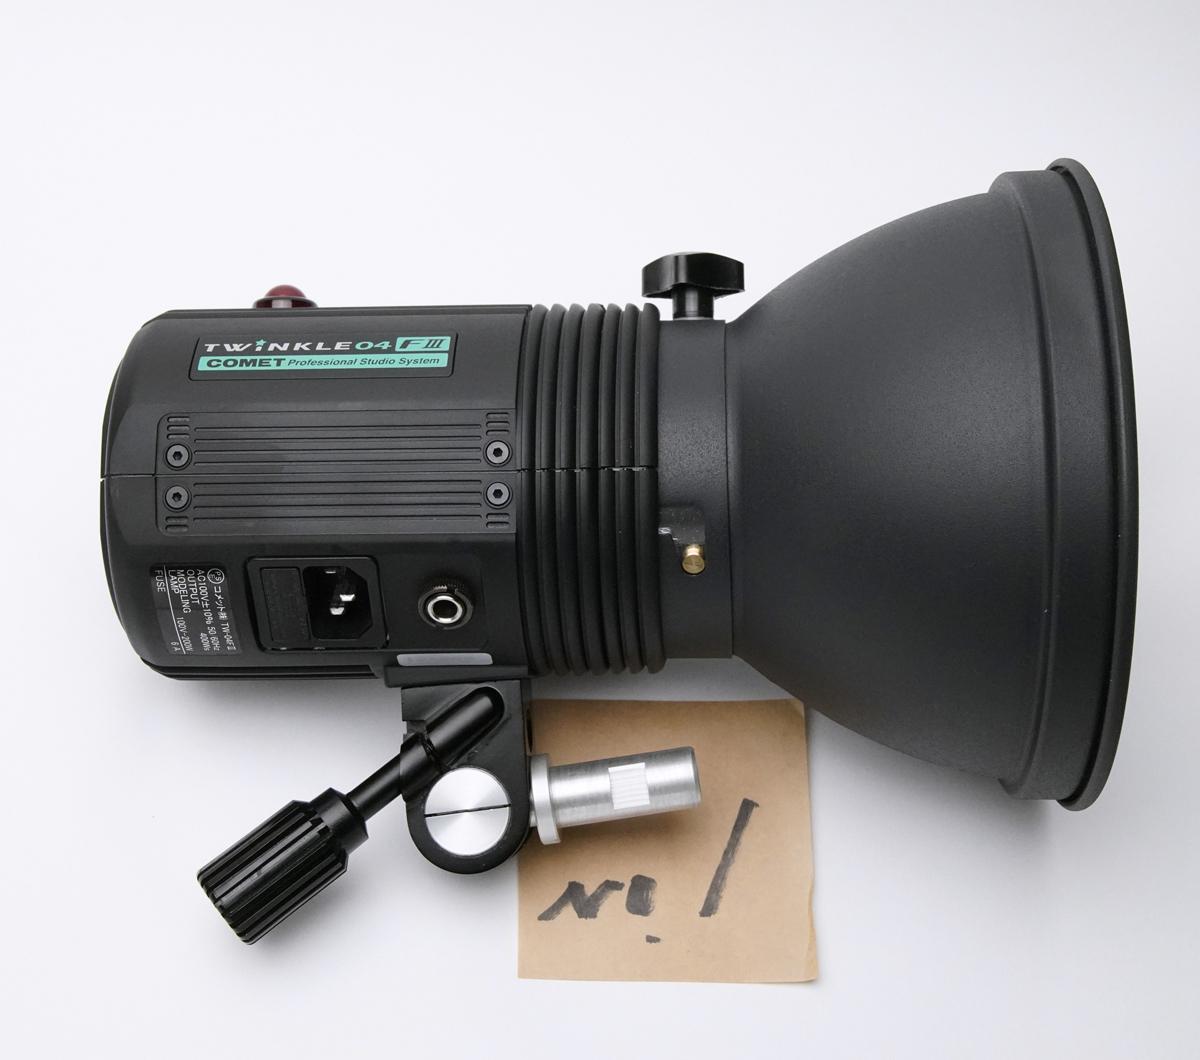 COMET コメット TWINKLE 04F III + CX-Cリフレクター テスト発光のみ美品_画像2